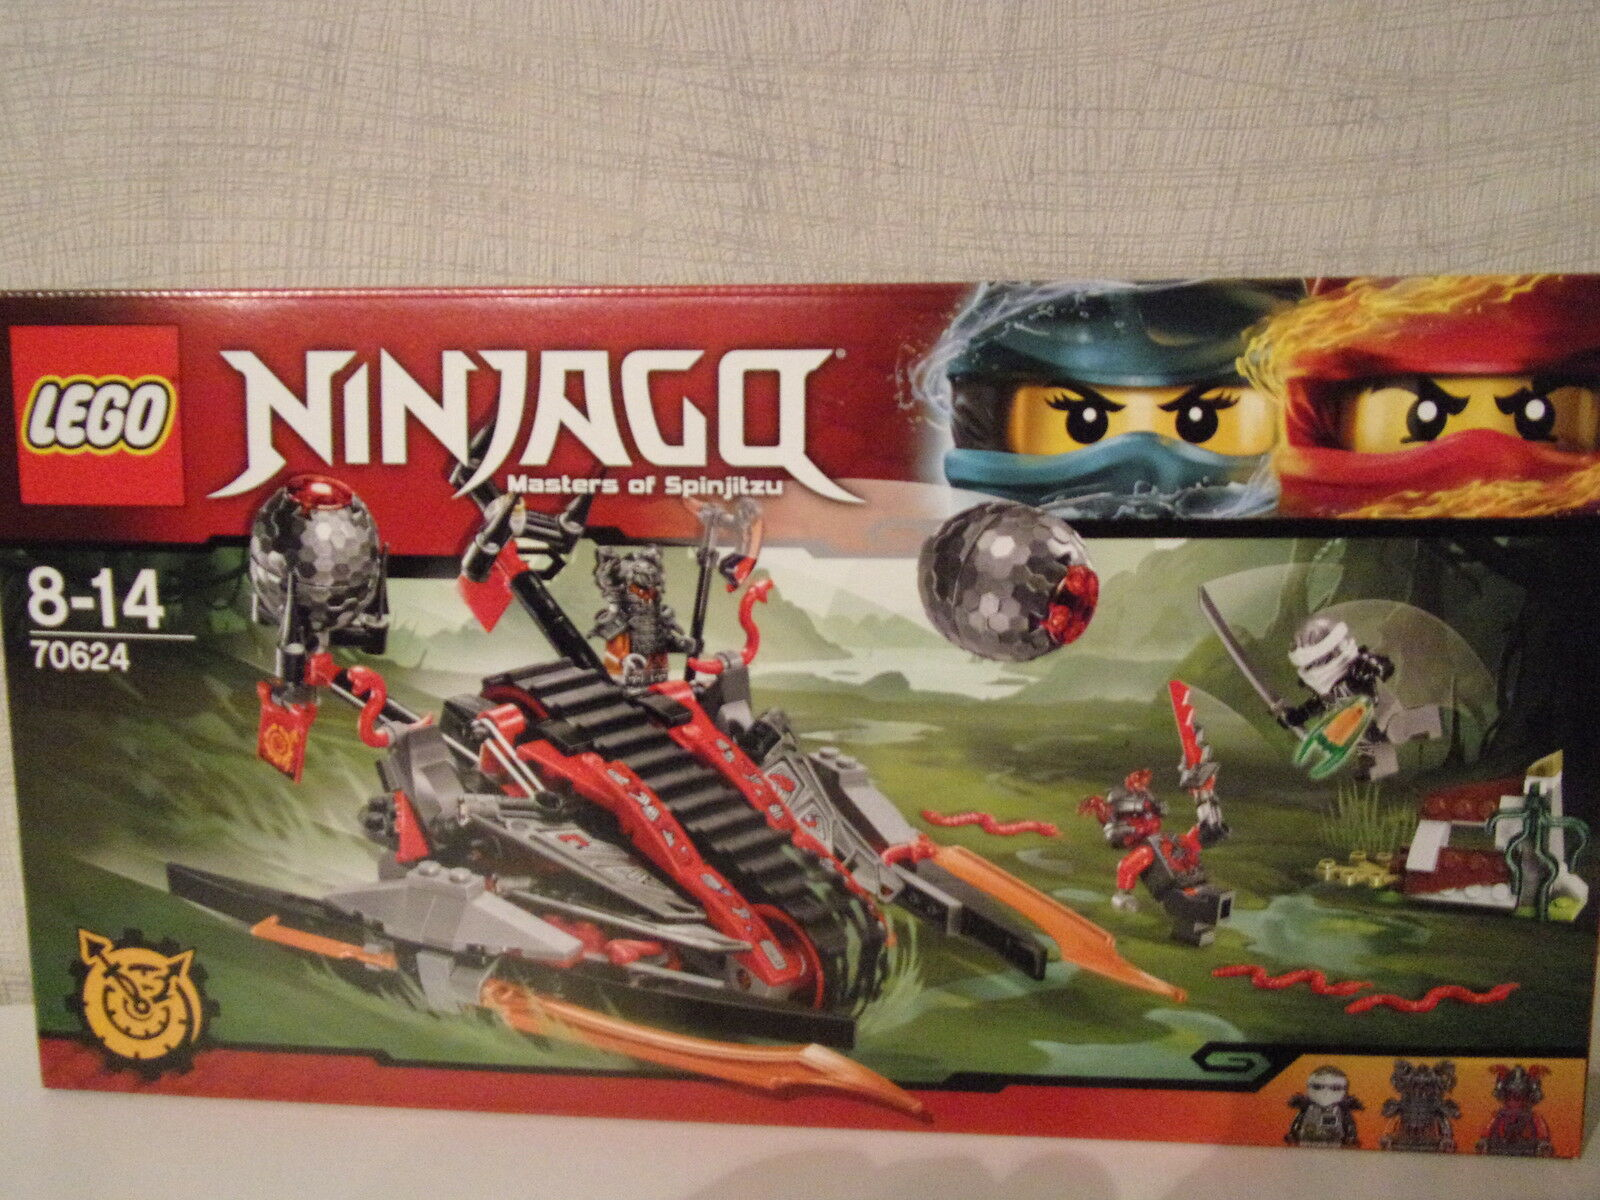 Lego Ninjago 70624 Vermillion Eindringling - NEU & & & OVP 5de97c